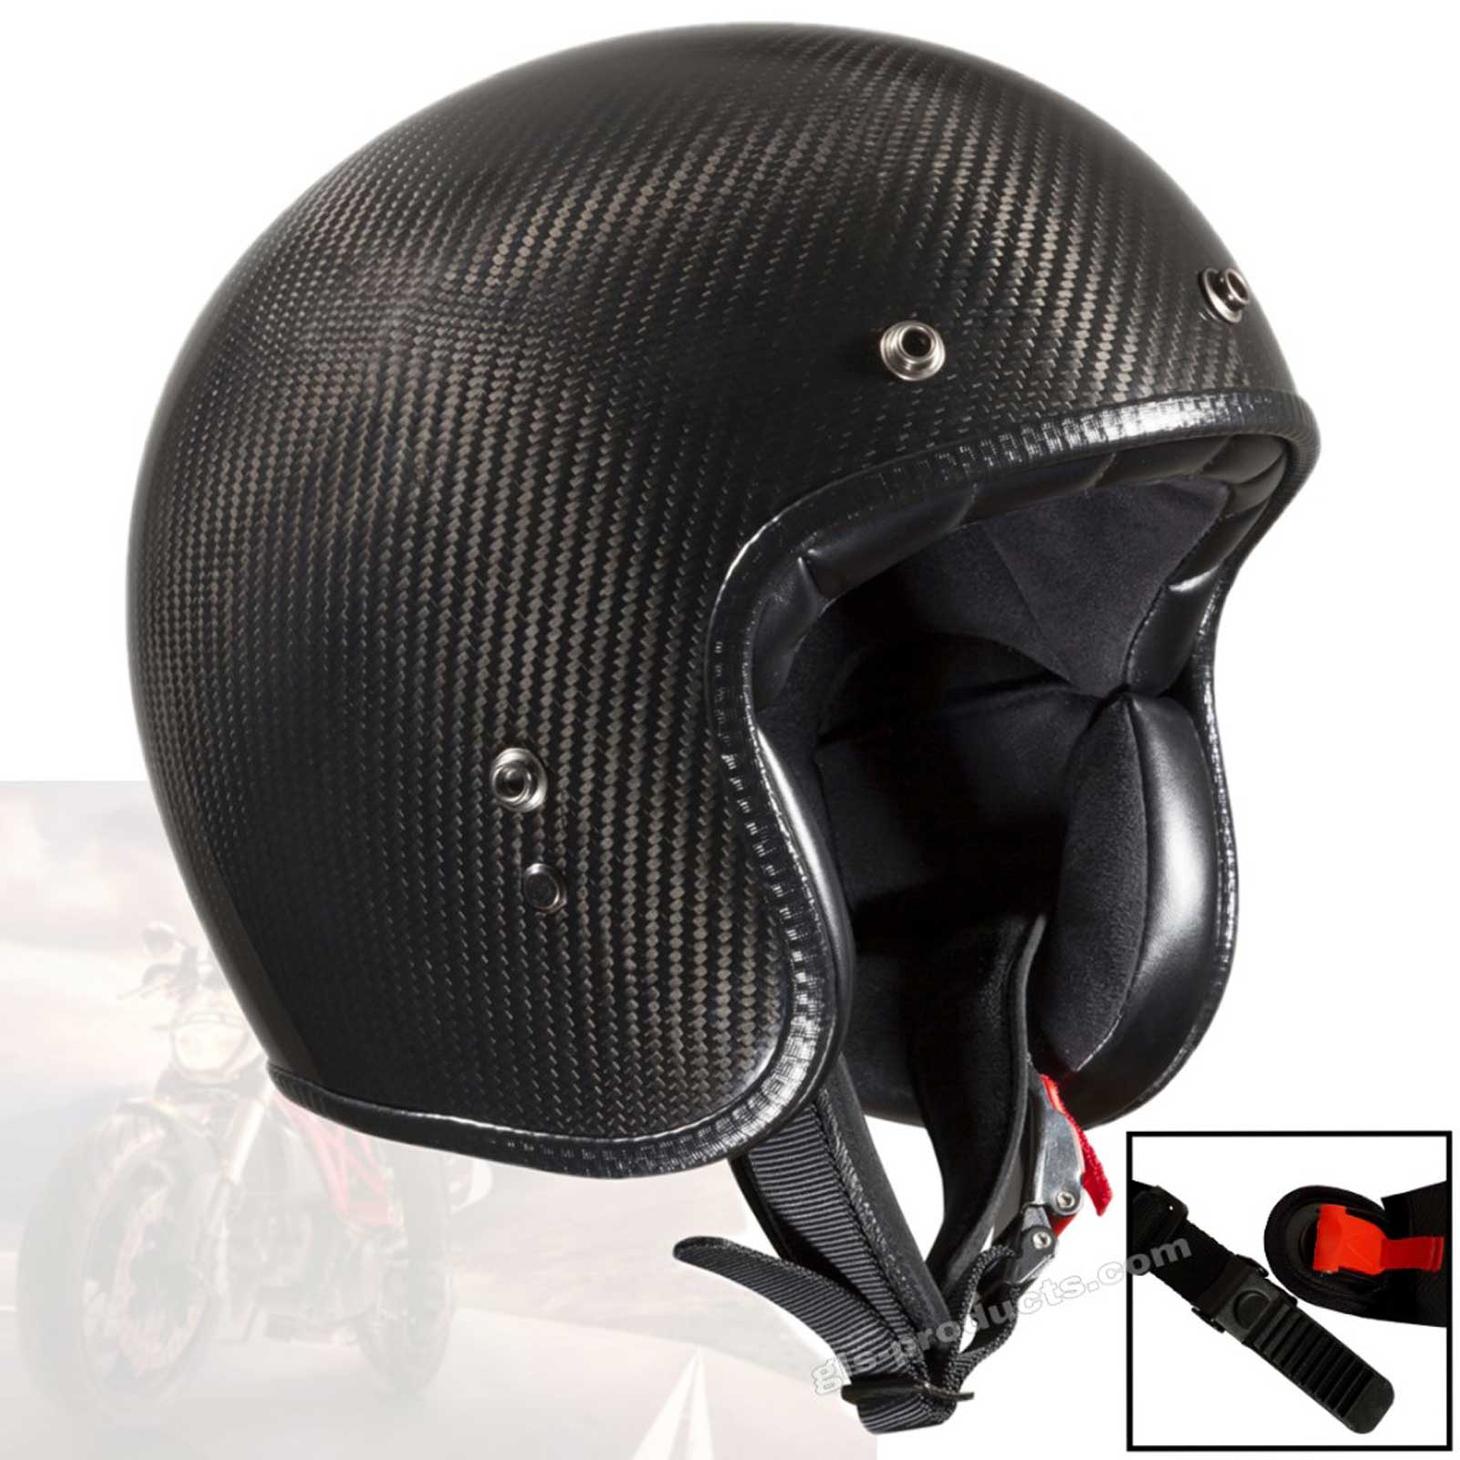 ECE-certified Carbon jet helmet by Bandit Helmets – Picture 1